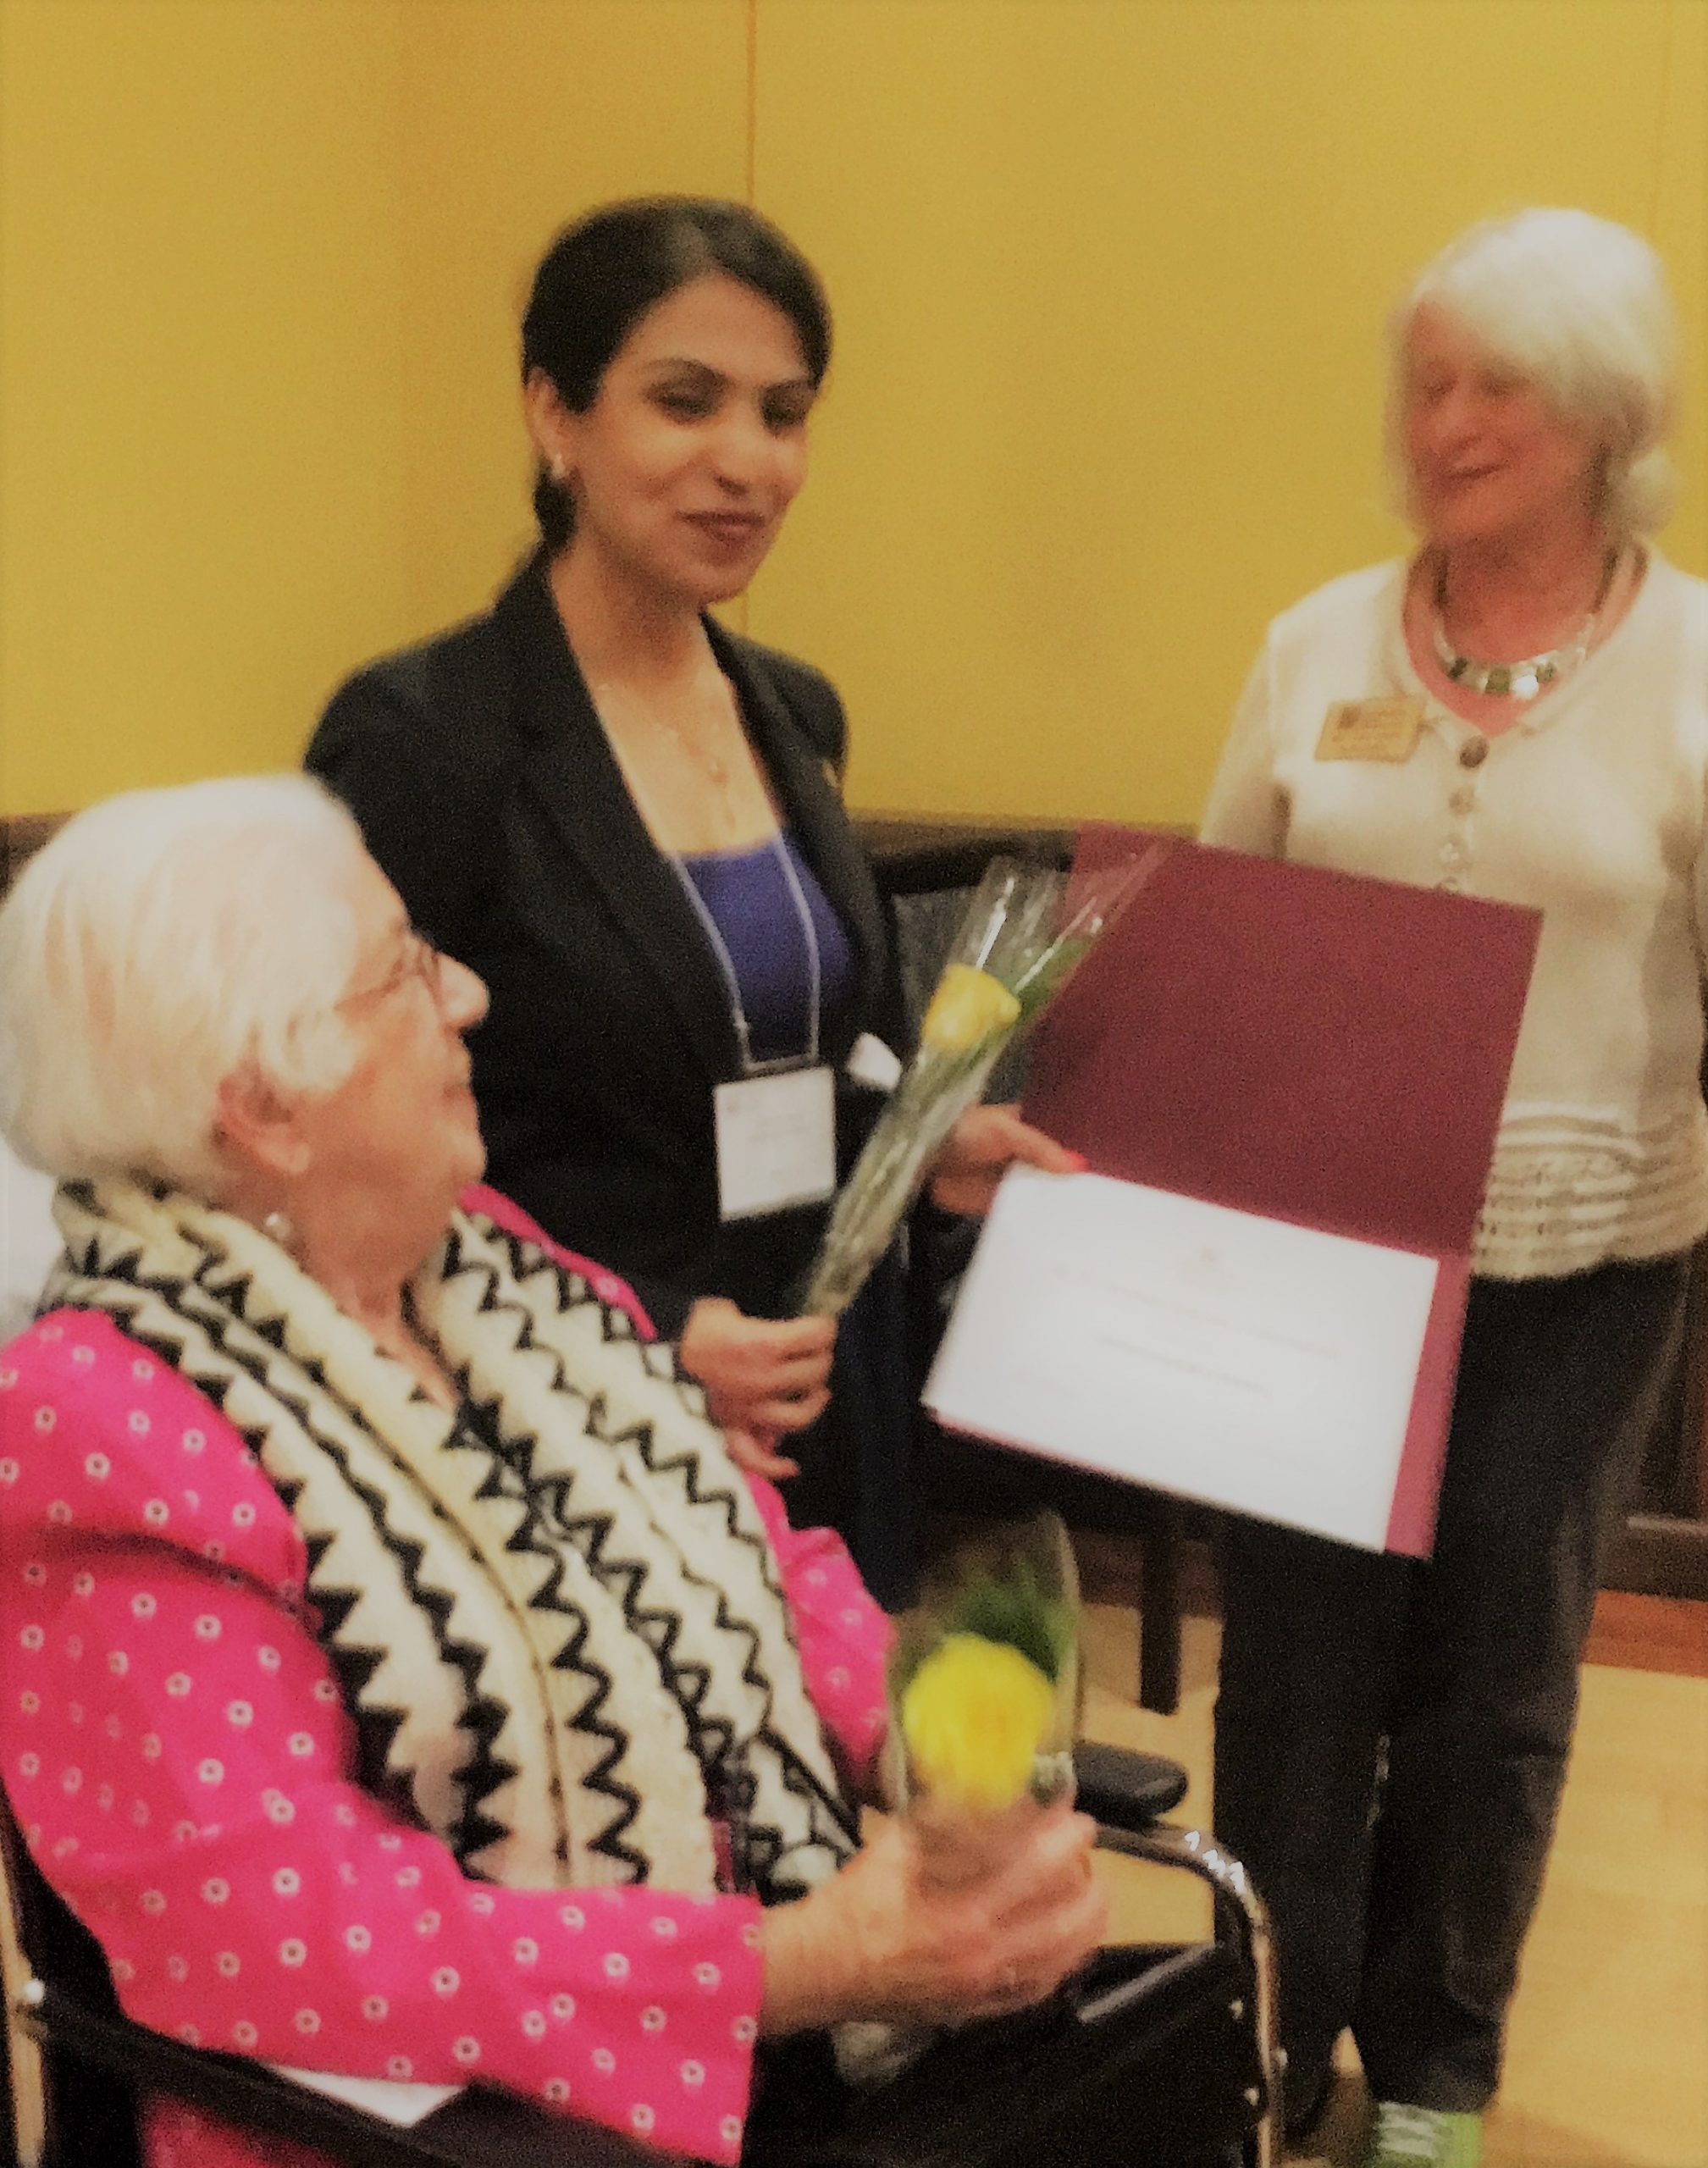 Dr. Zohreh Assa, Amelia Earhart Fellow, receiving her Silver Wings